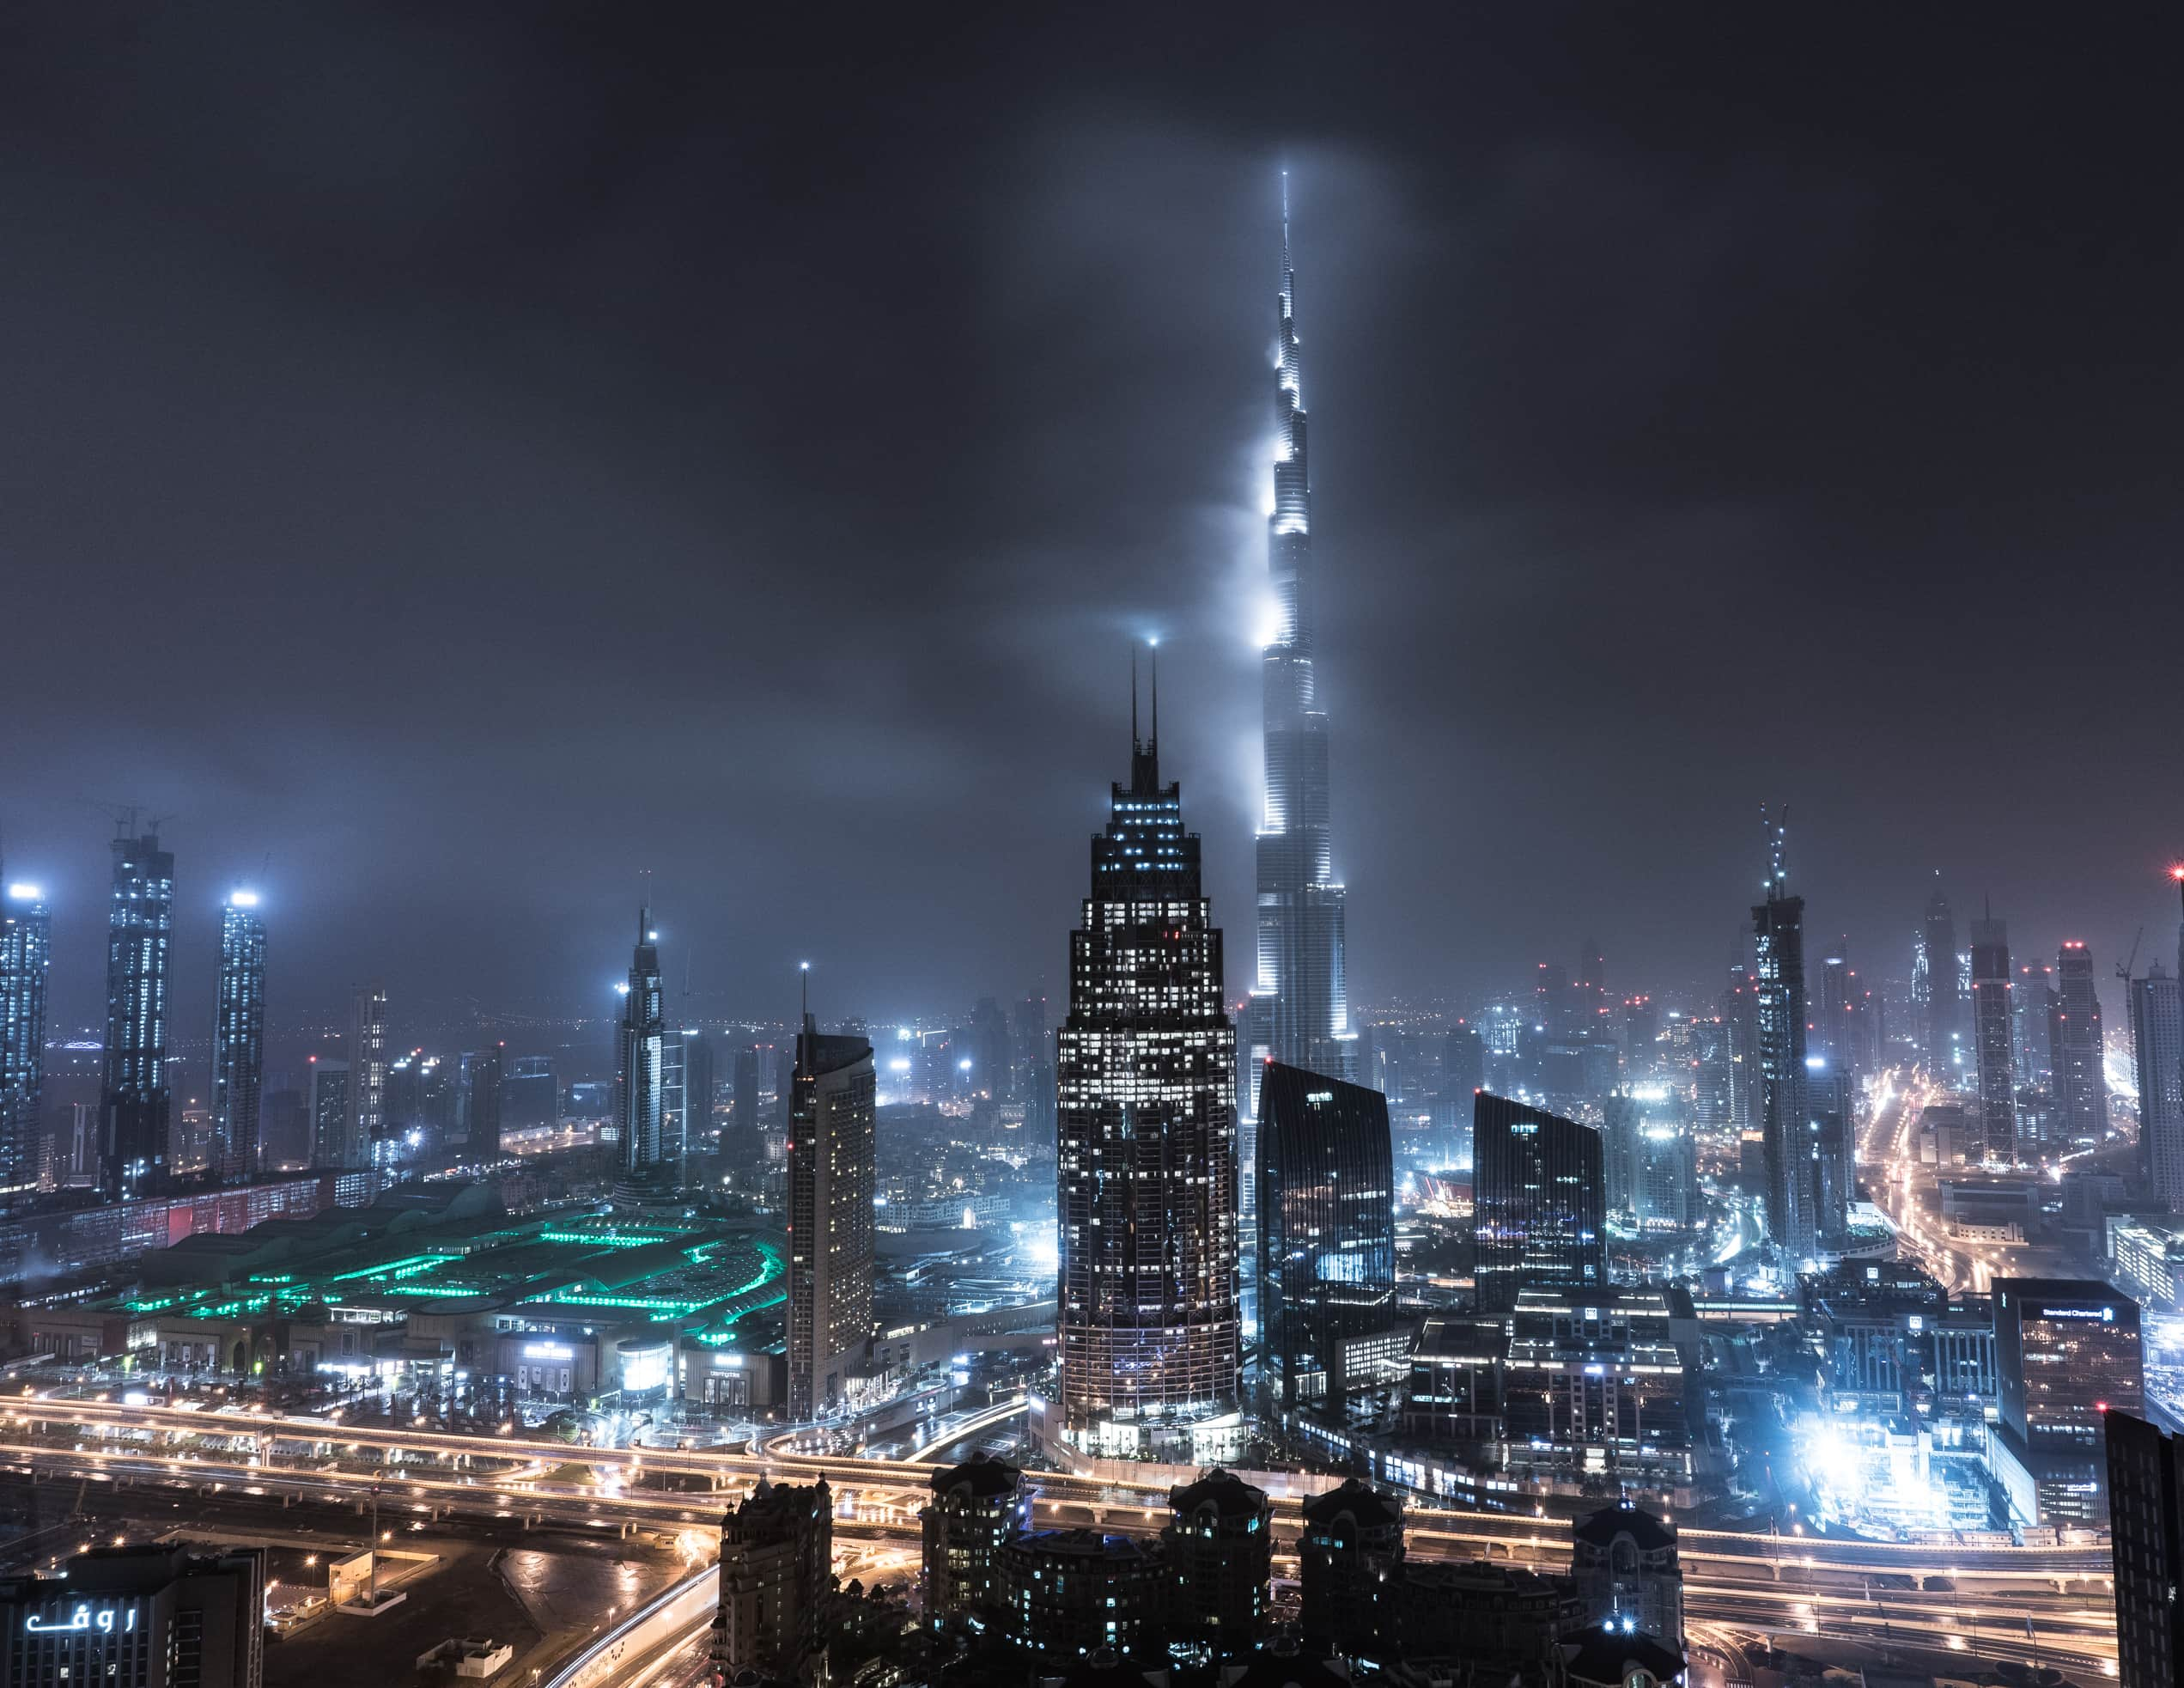 Burj Khalifa shrouded in storm clouds